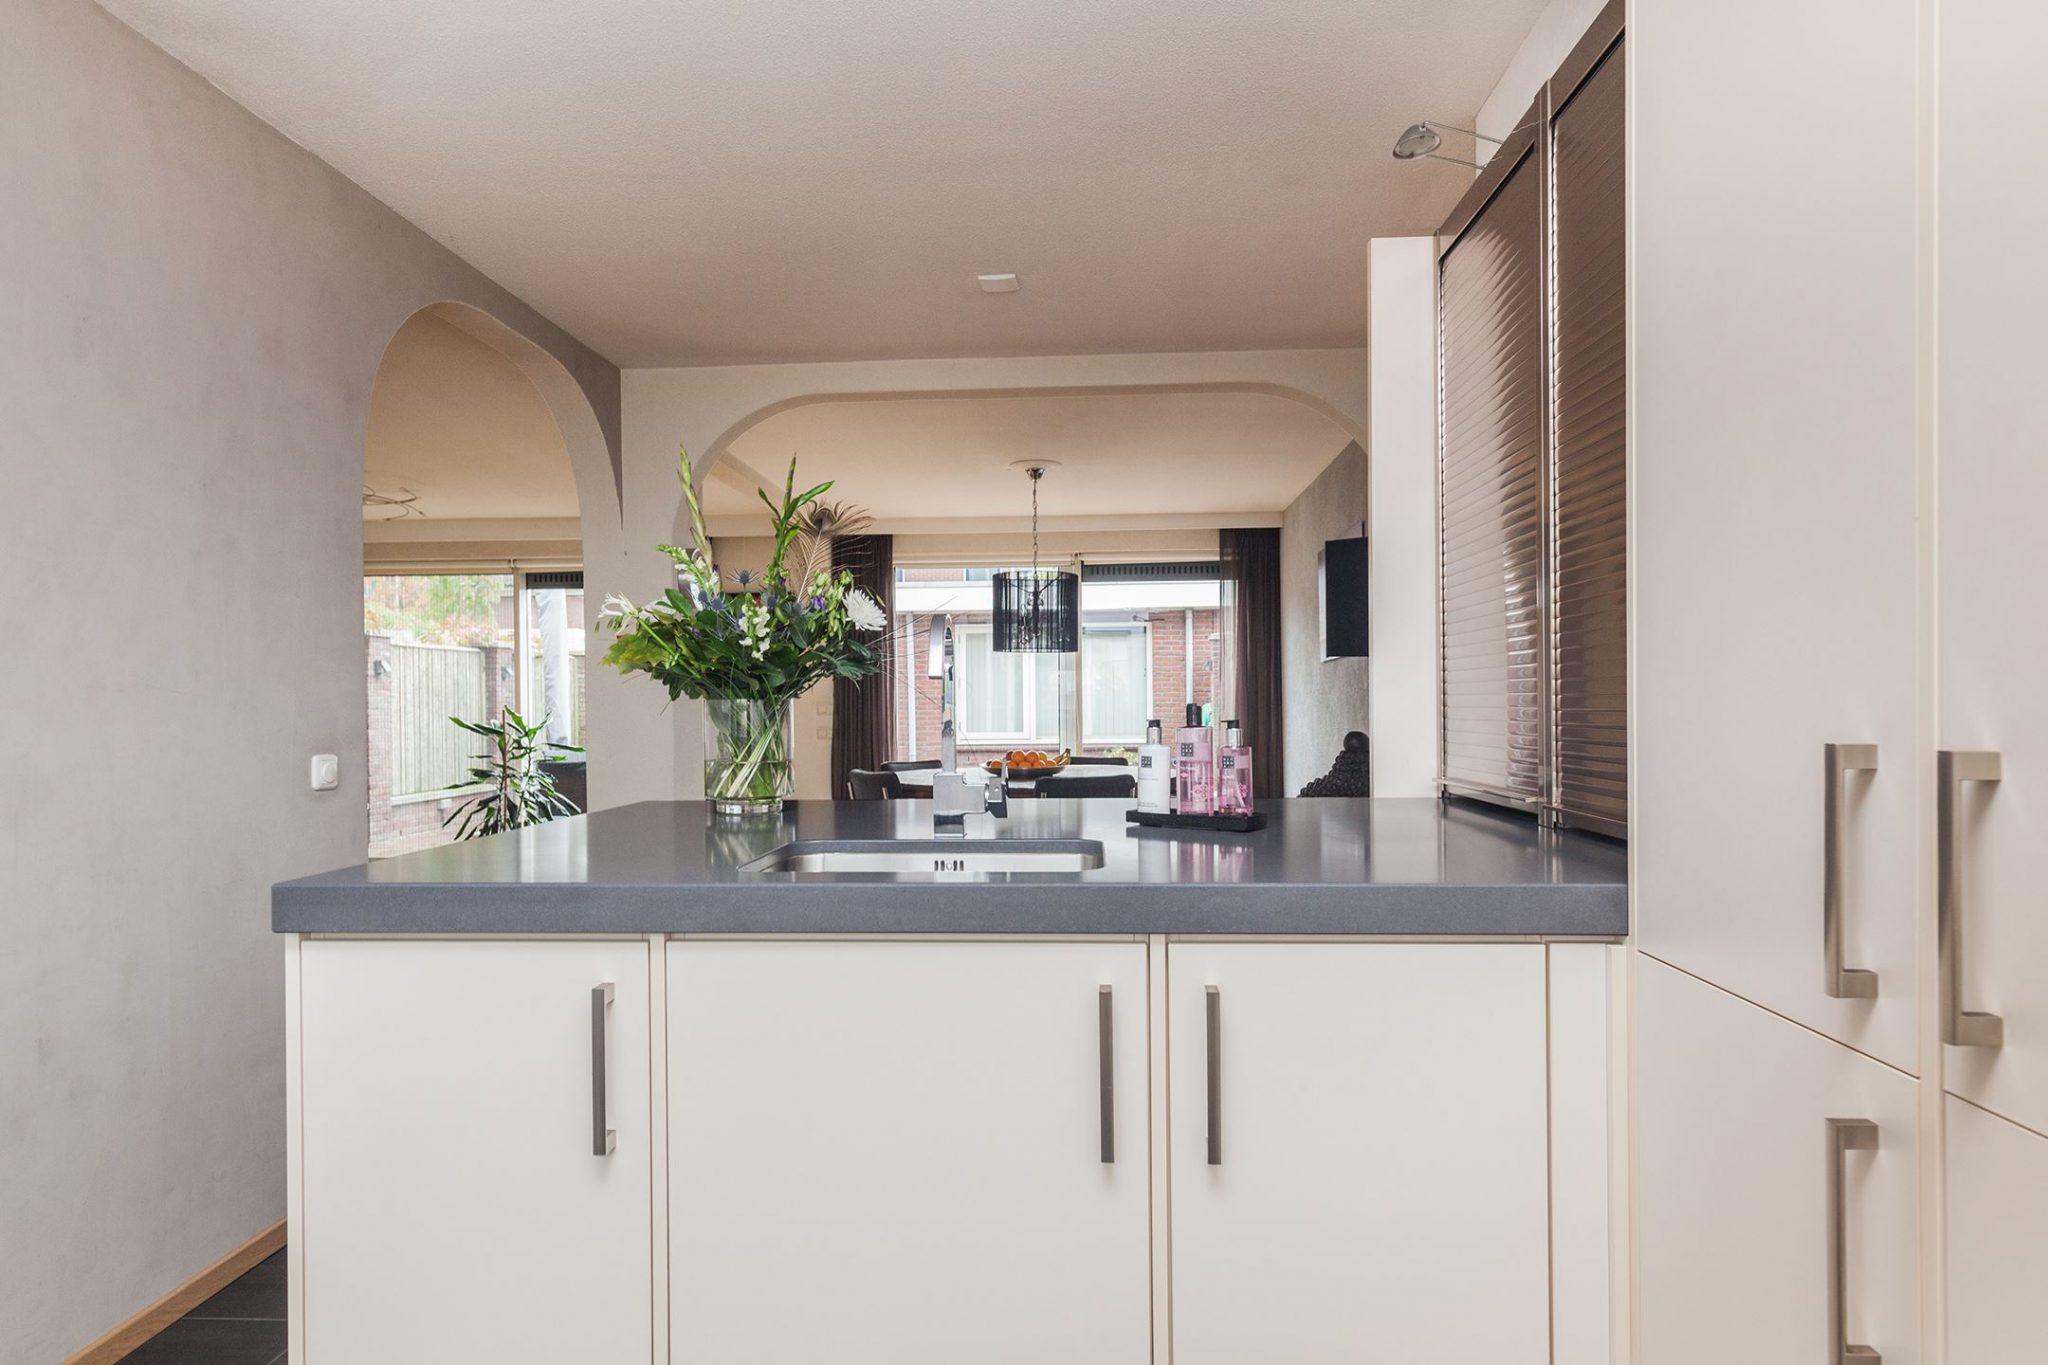 brocante keuken met eiland : Moderne Witte Strakke Keuken Kookeiland Spoeleiland Graniet